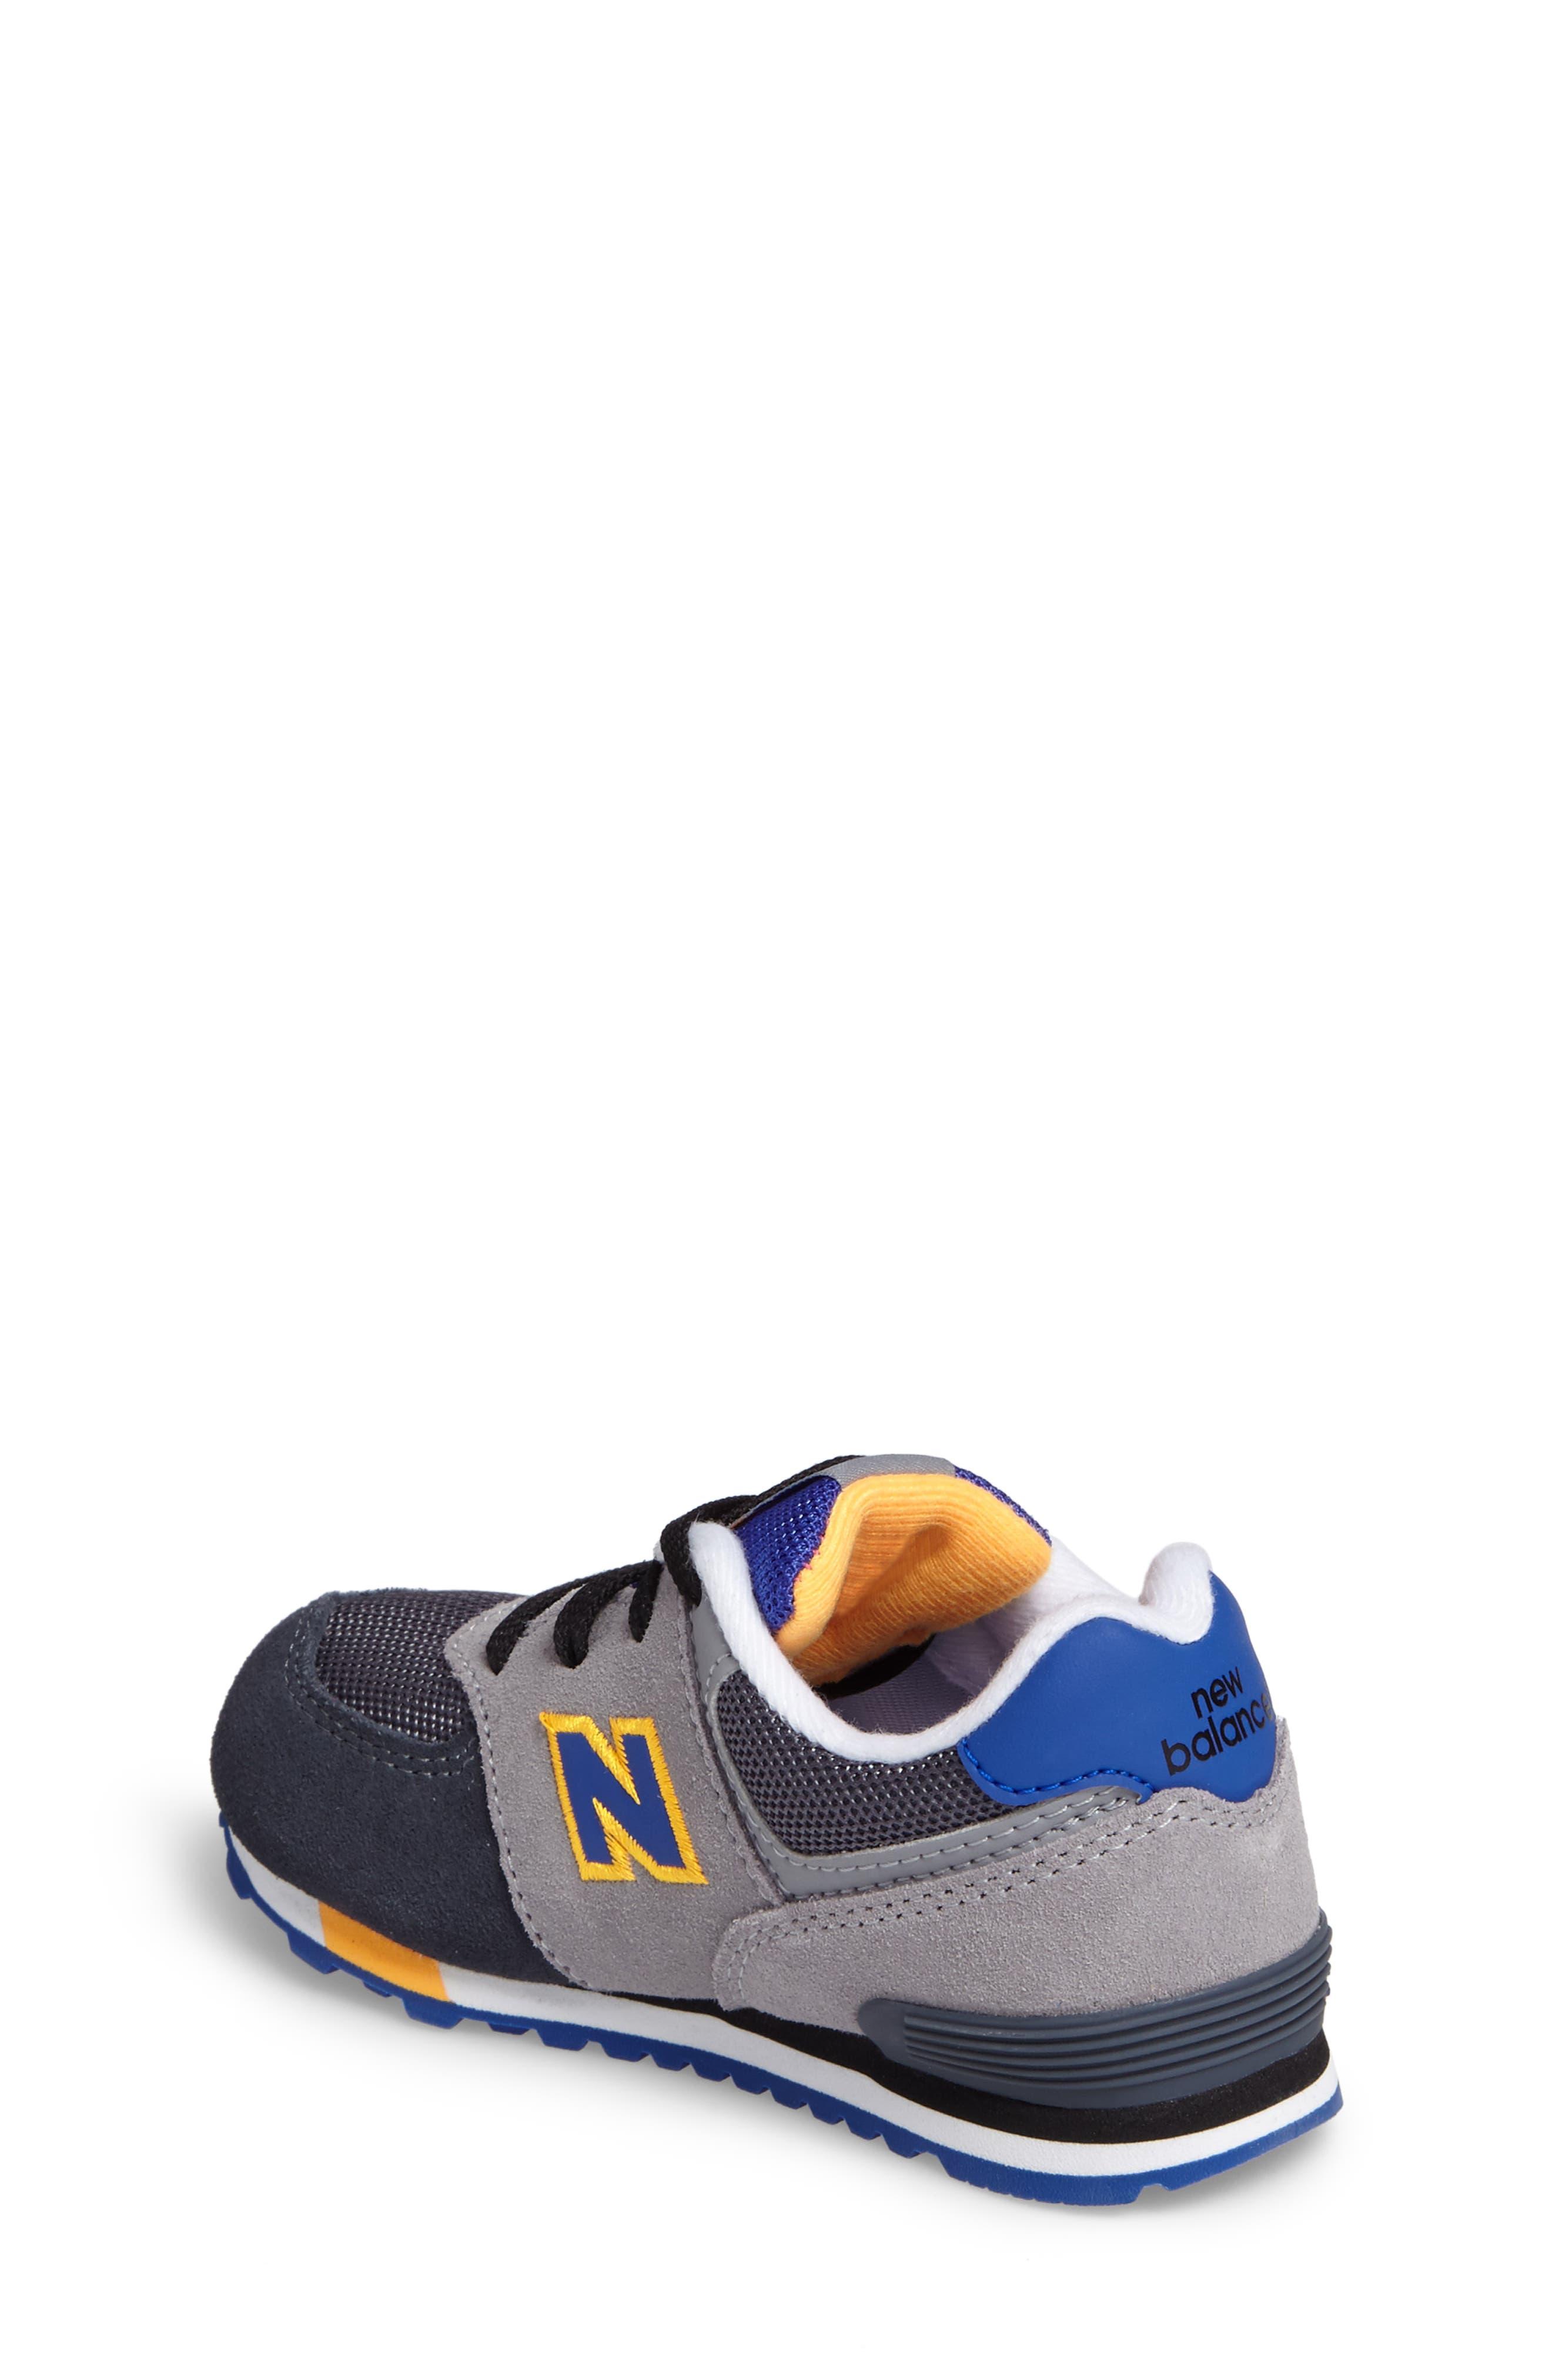 Alternate Image 2  - New Balance 574 Cut & Paste Sneaker (Baby, Walker & Toddler)